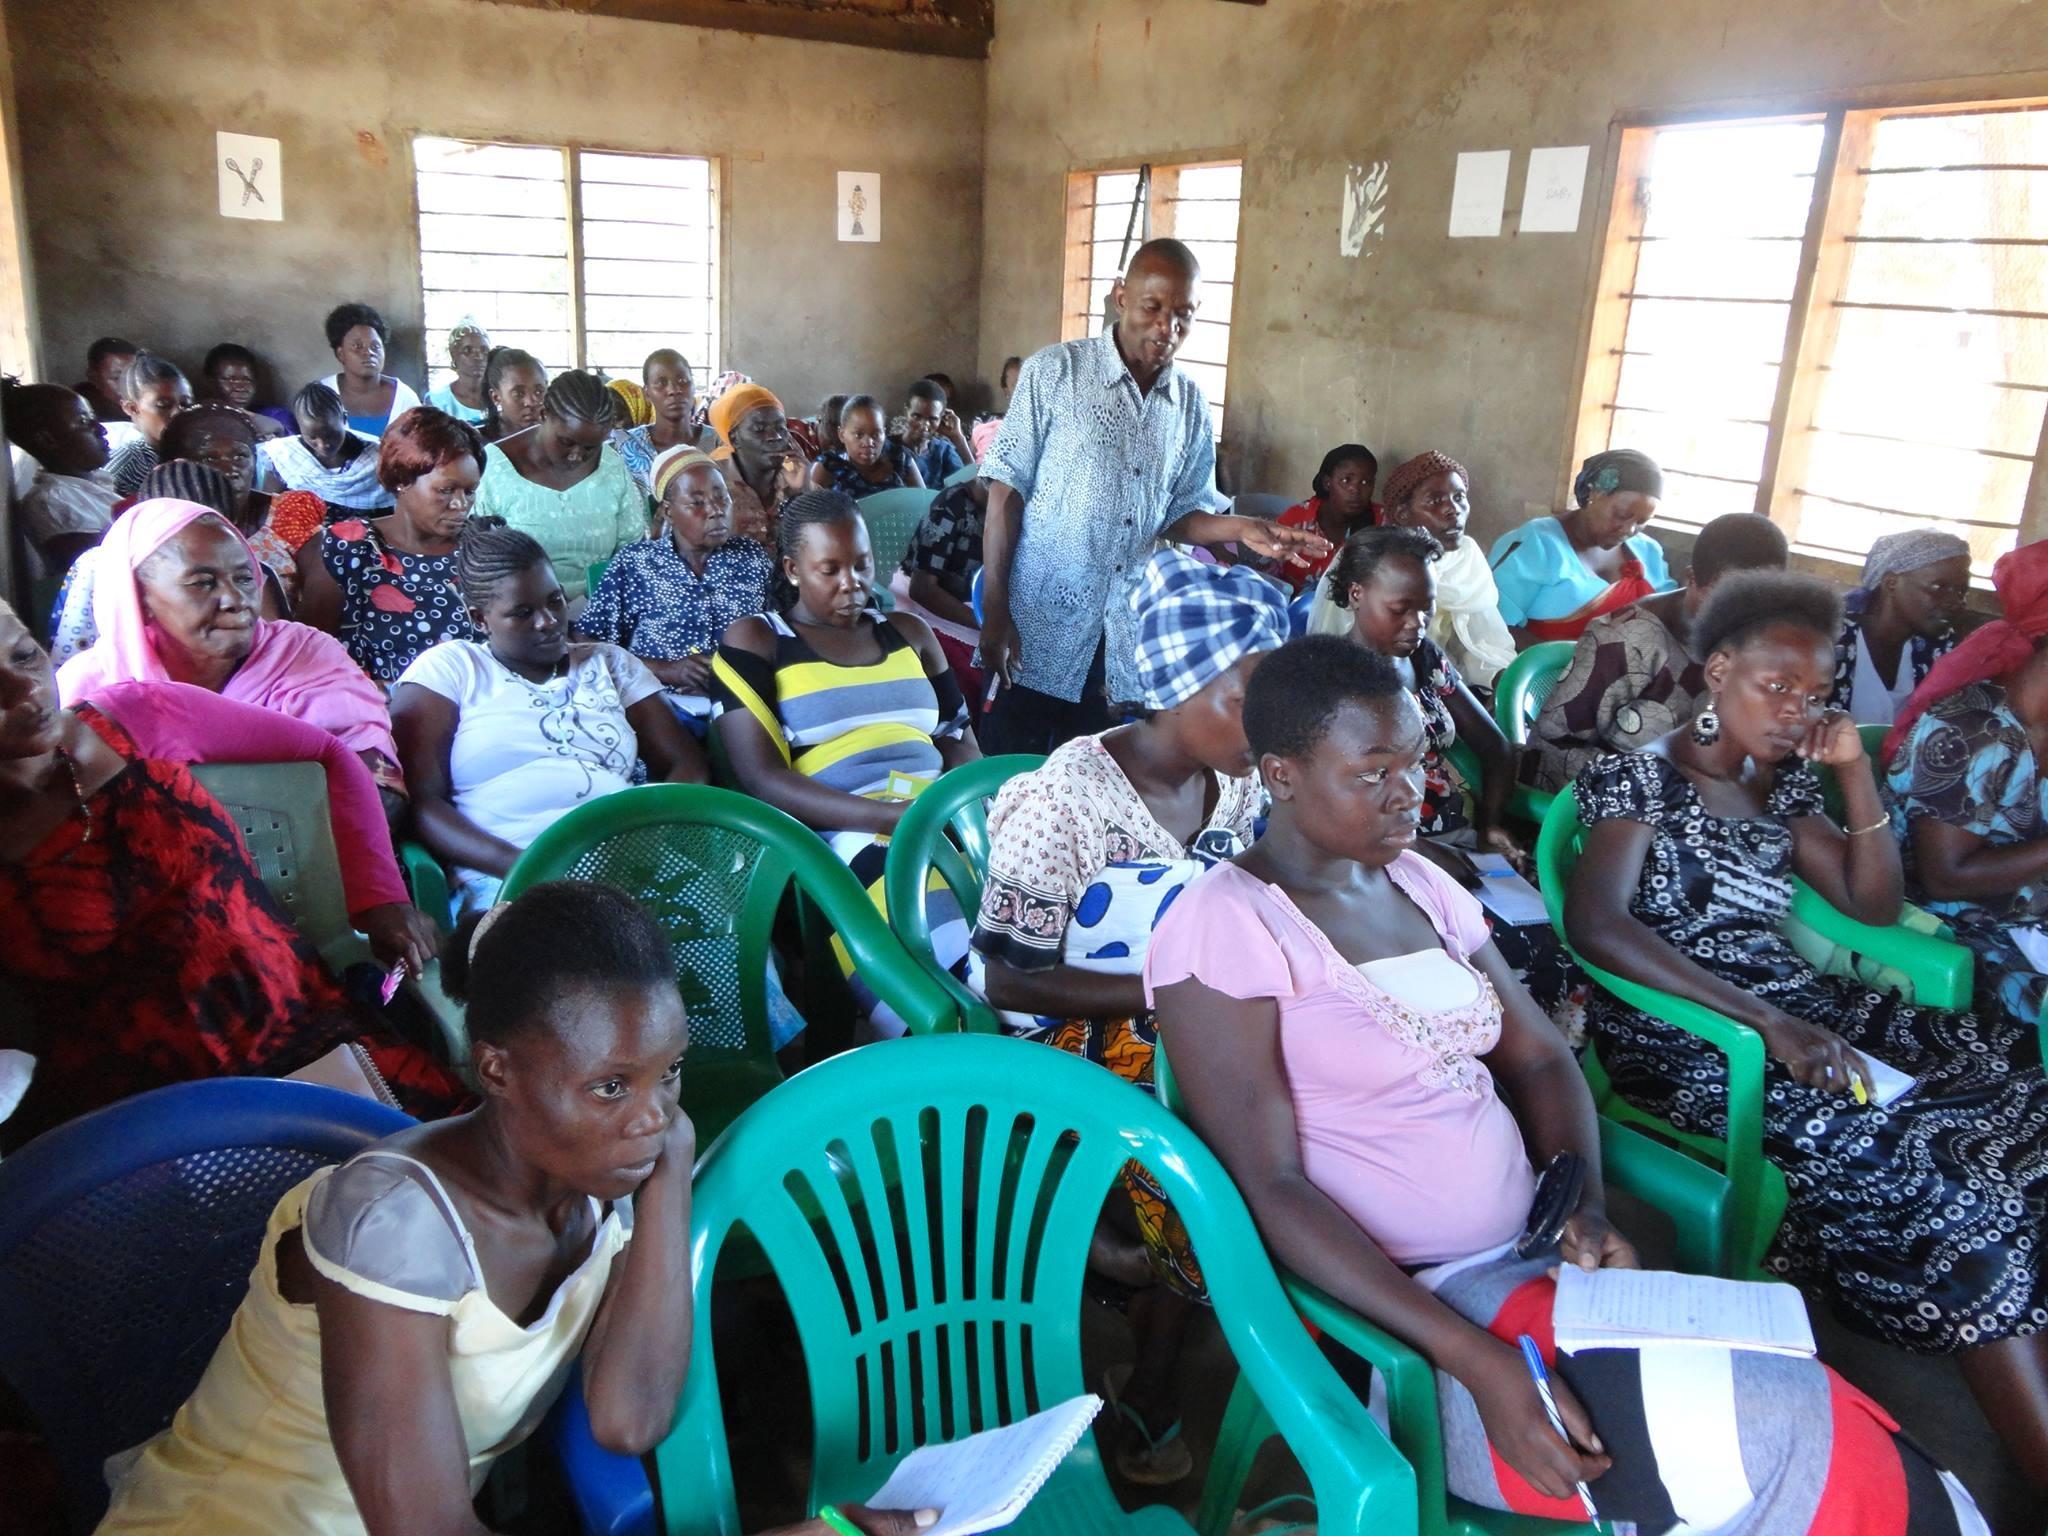 Donate to Empowering 100 Women Entrepreneurs in Tanzania - GlobalGiving